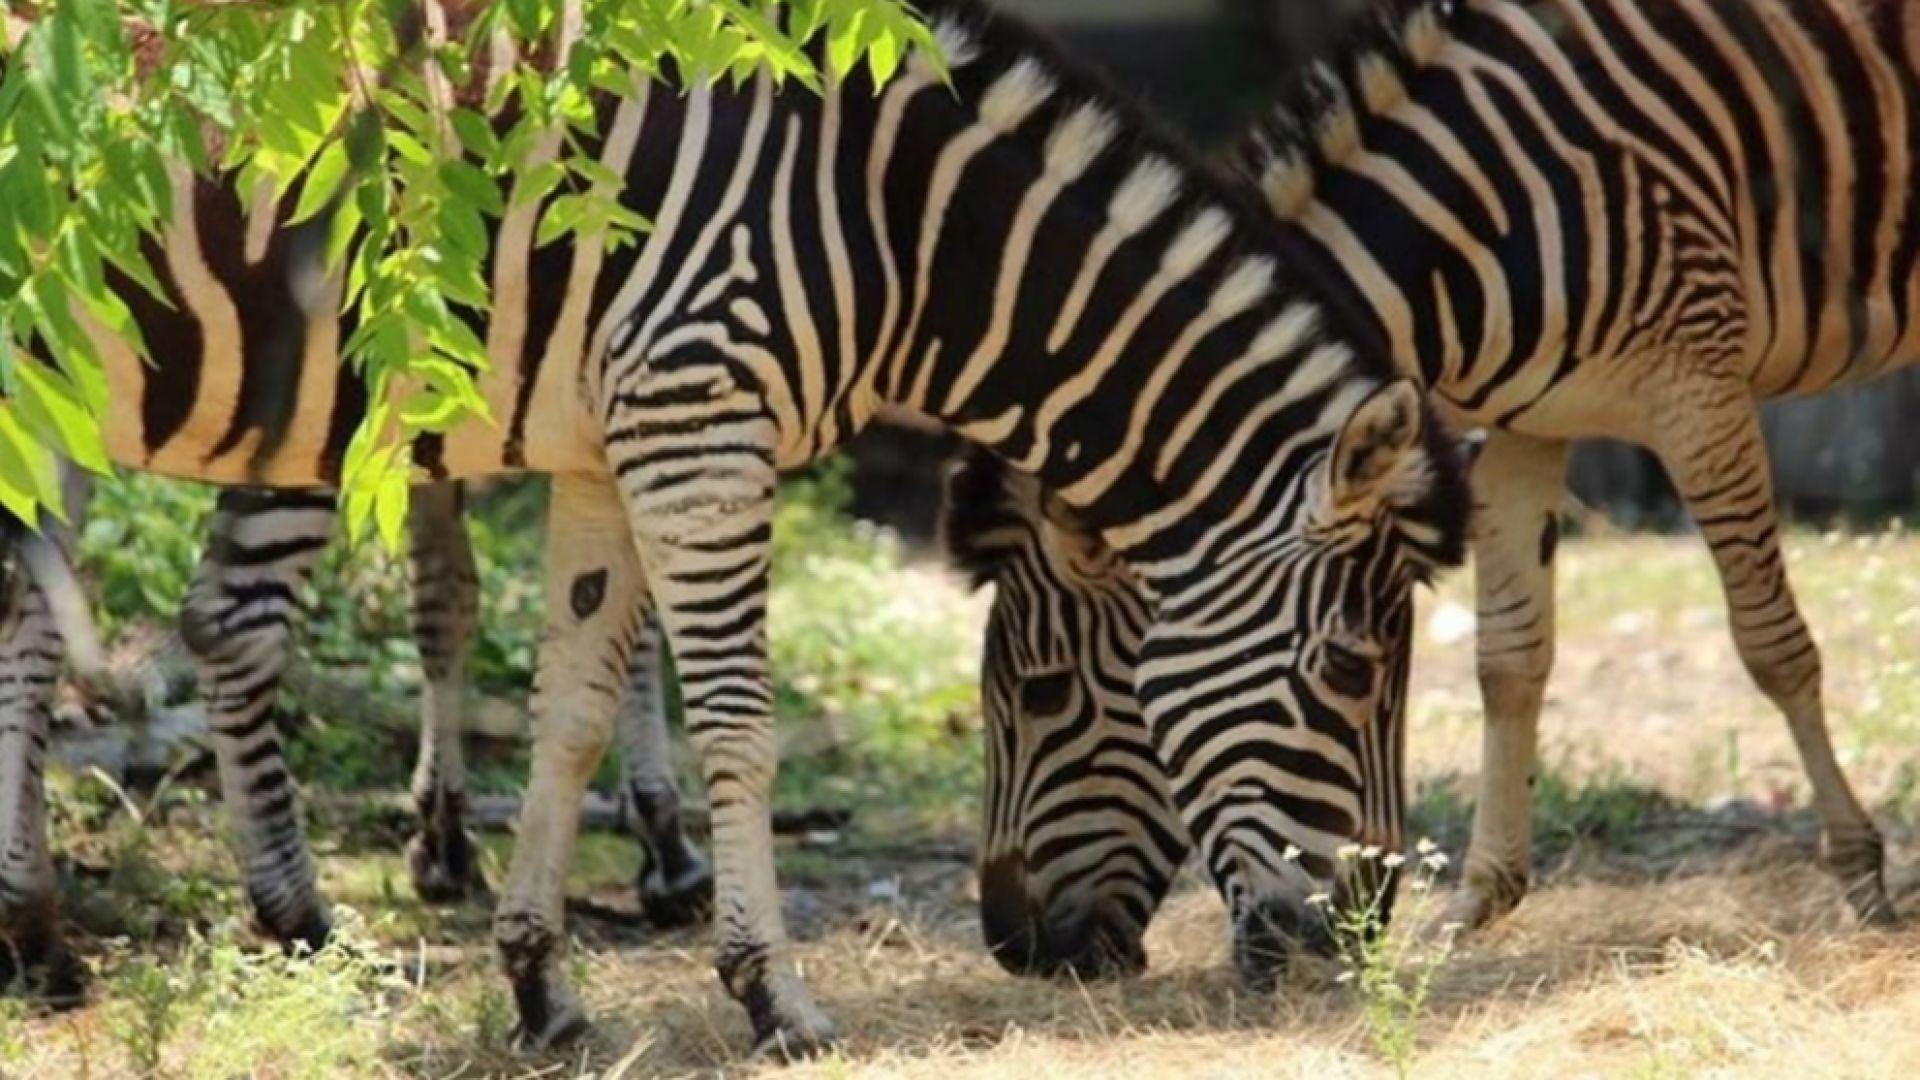 Софийският зоопарк получи стадо равнинни зебри (снимки)